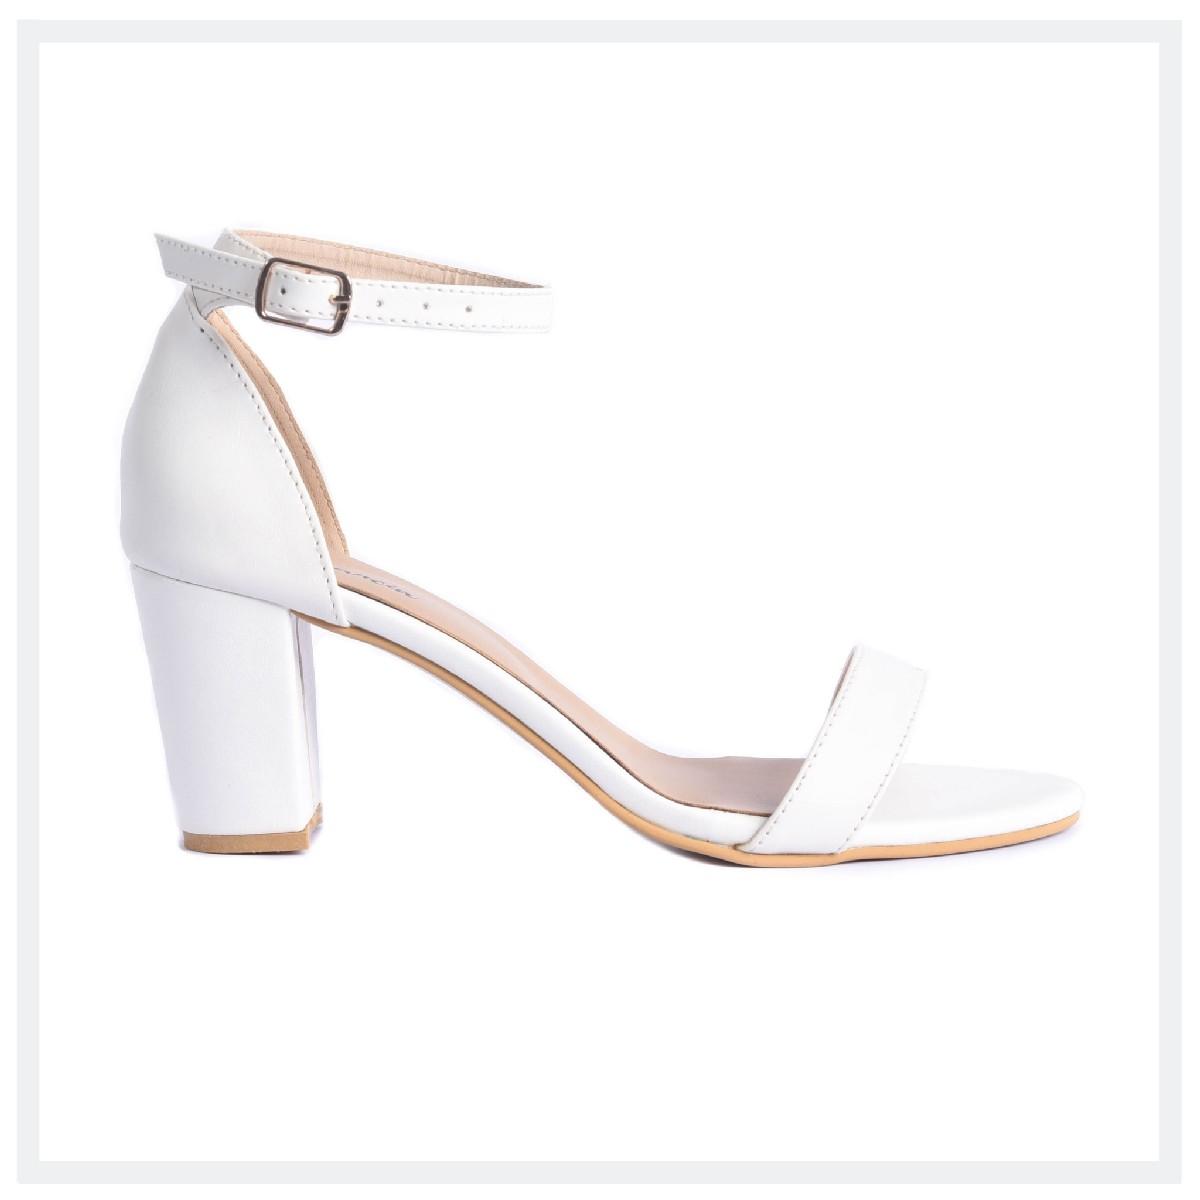 WILL  Women's High Heel Sandals  White  Elegancia